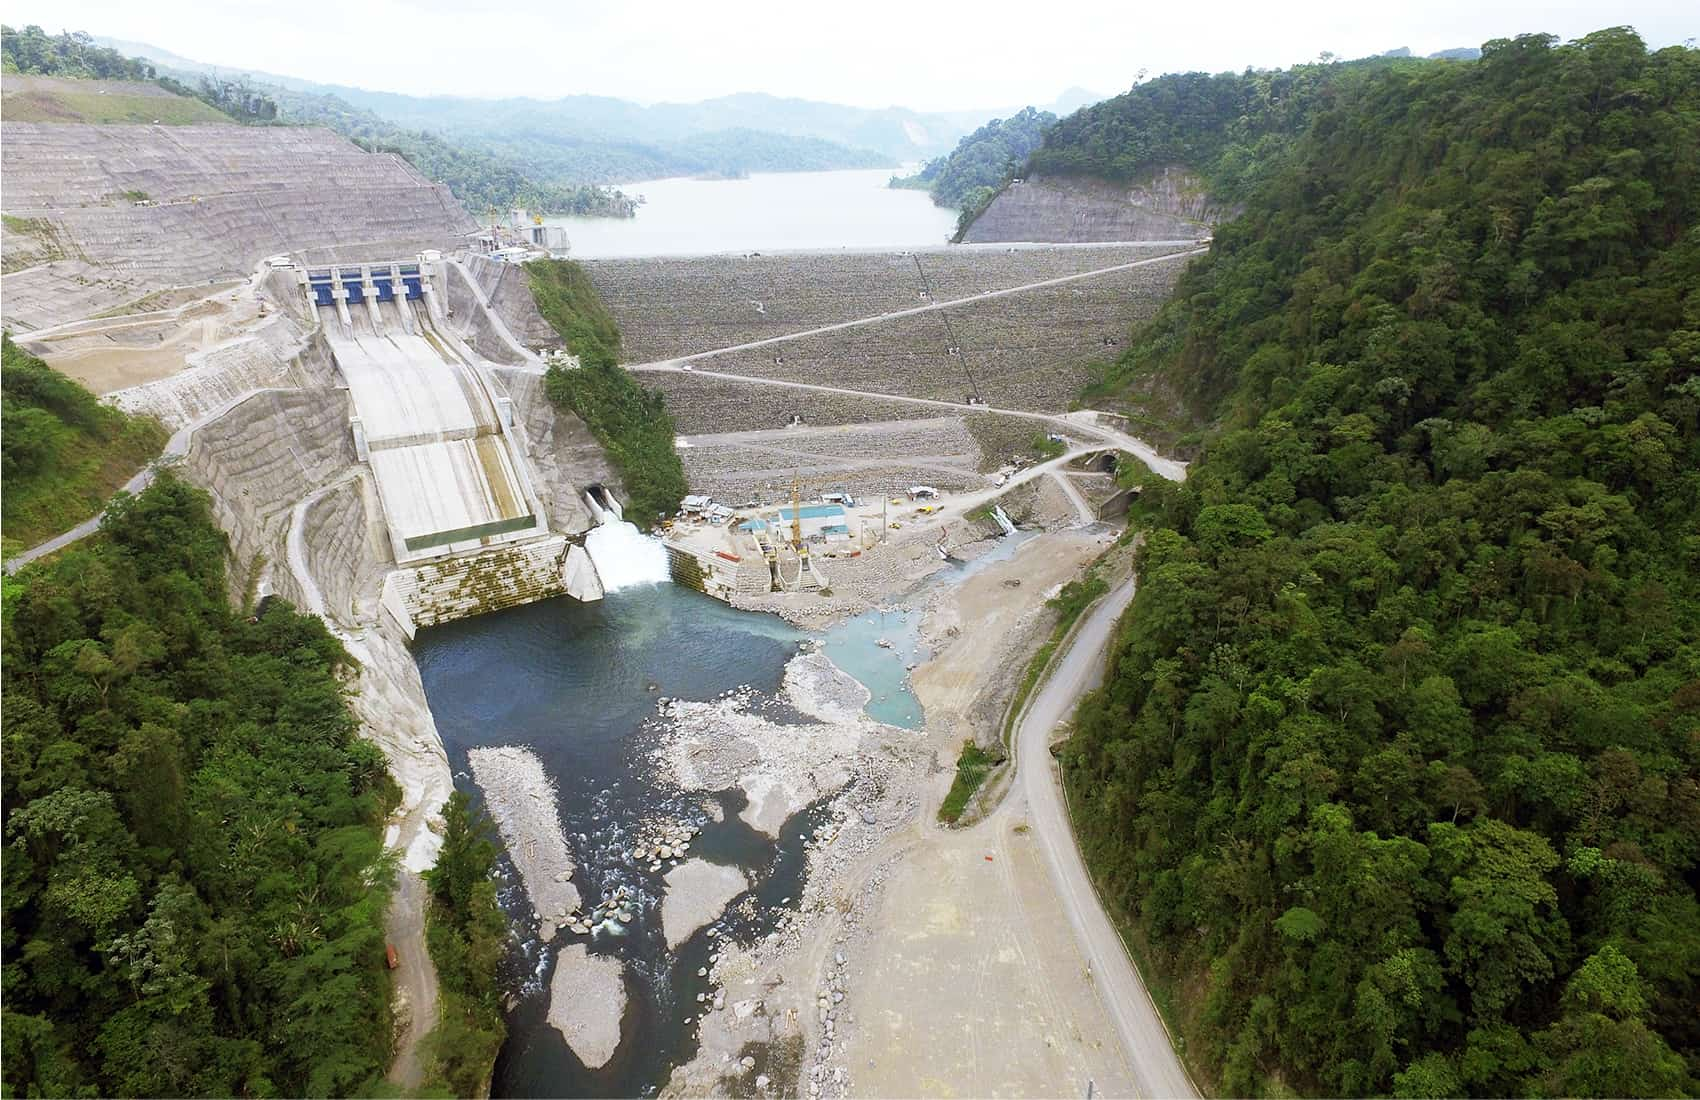 Reventazón hydroelectric plant